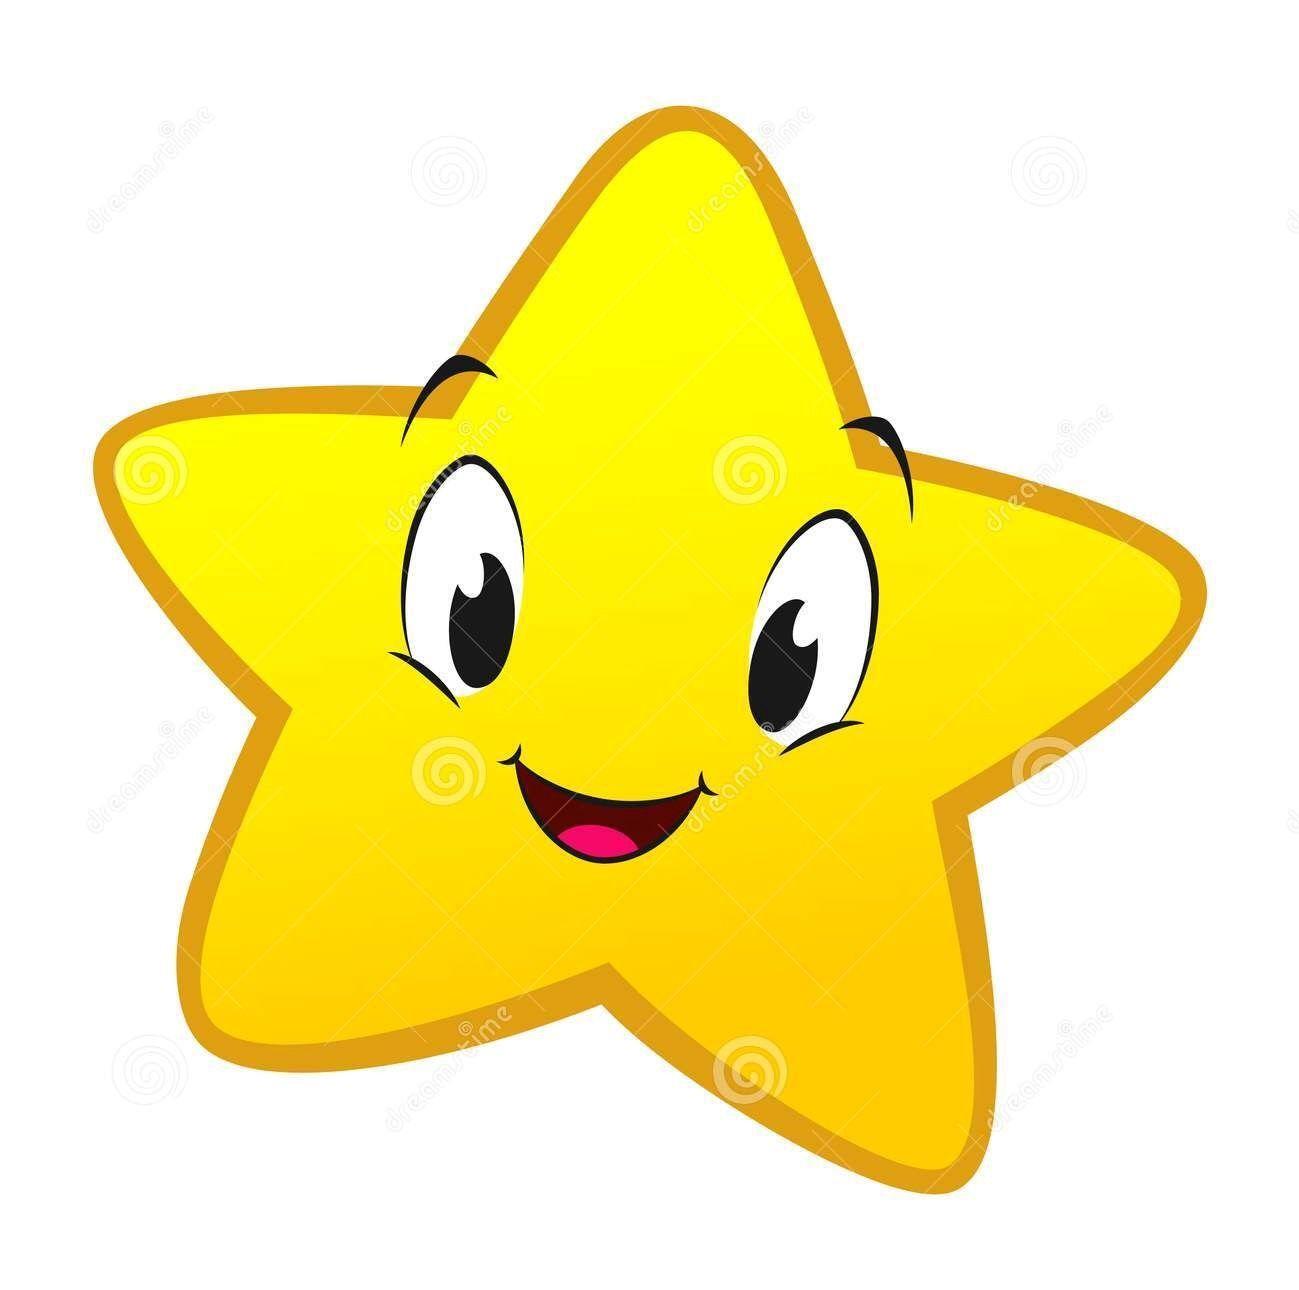 Dreamstime com stars cartoon. Cute clipart star